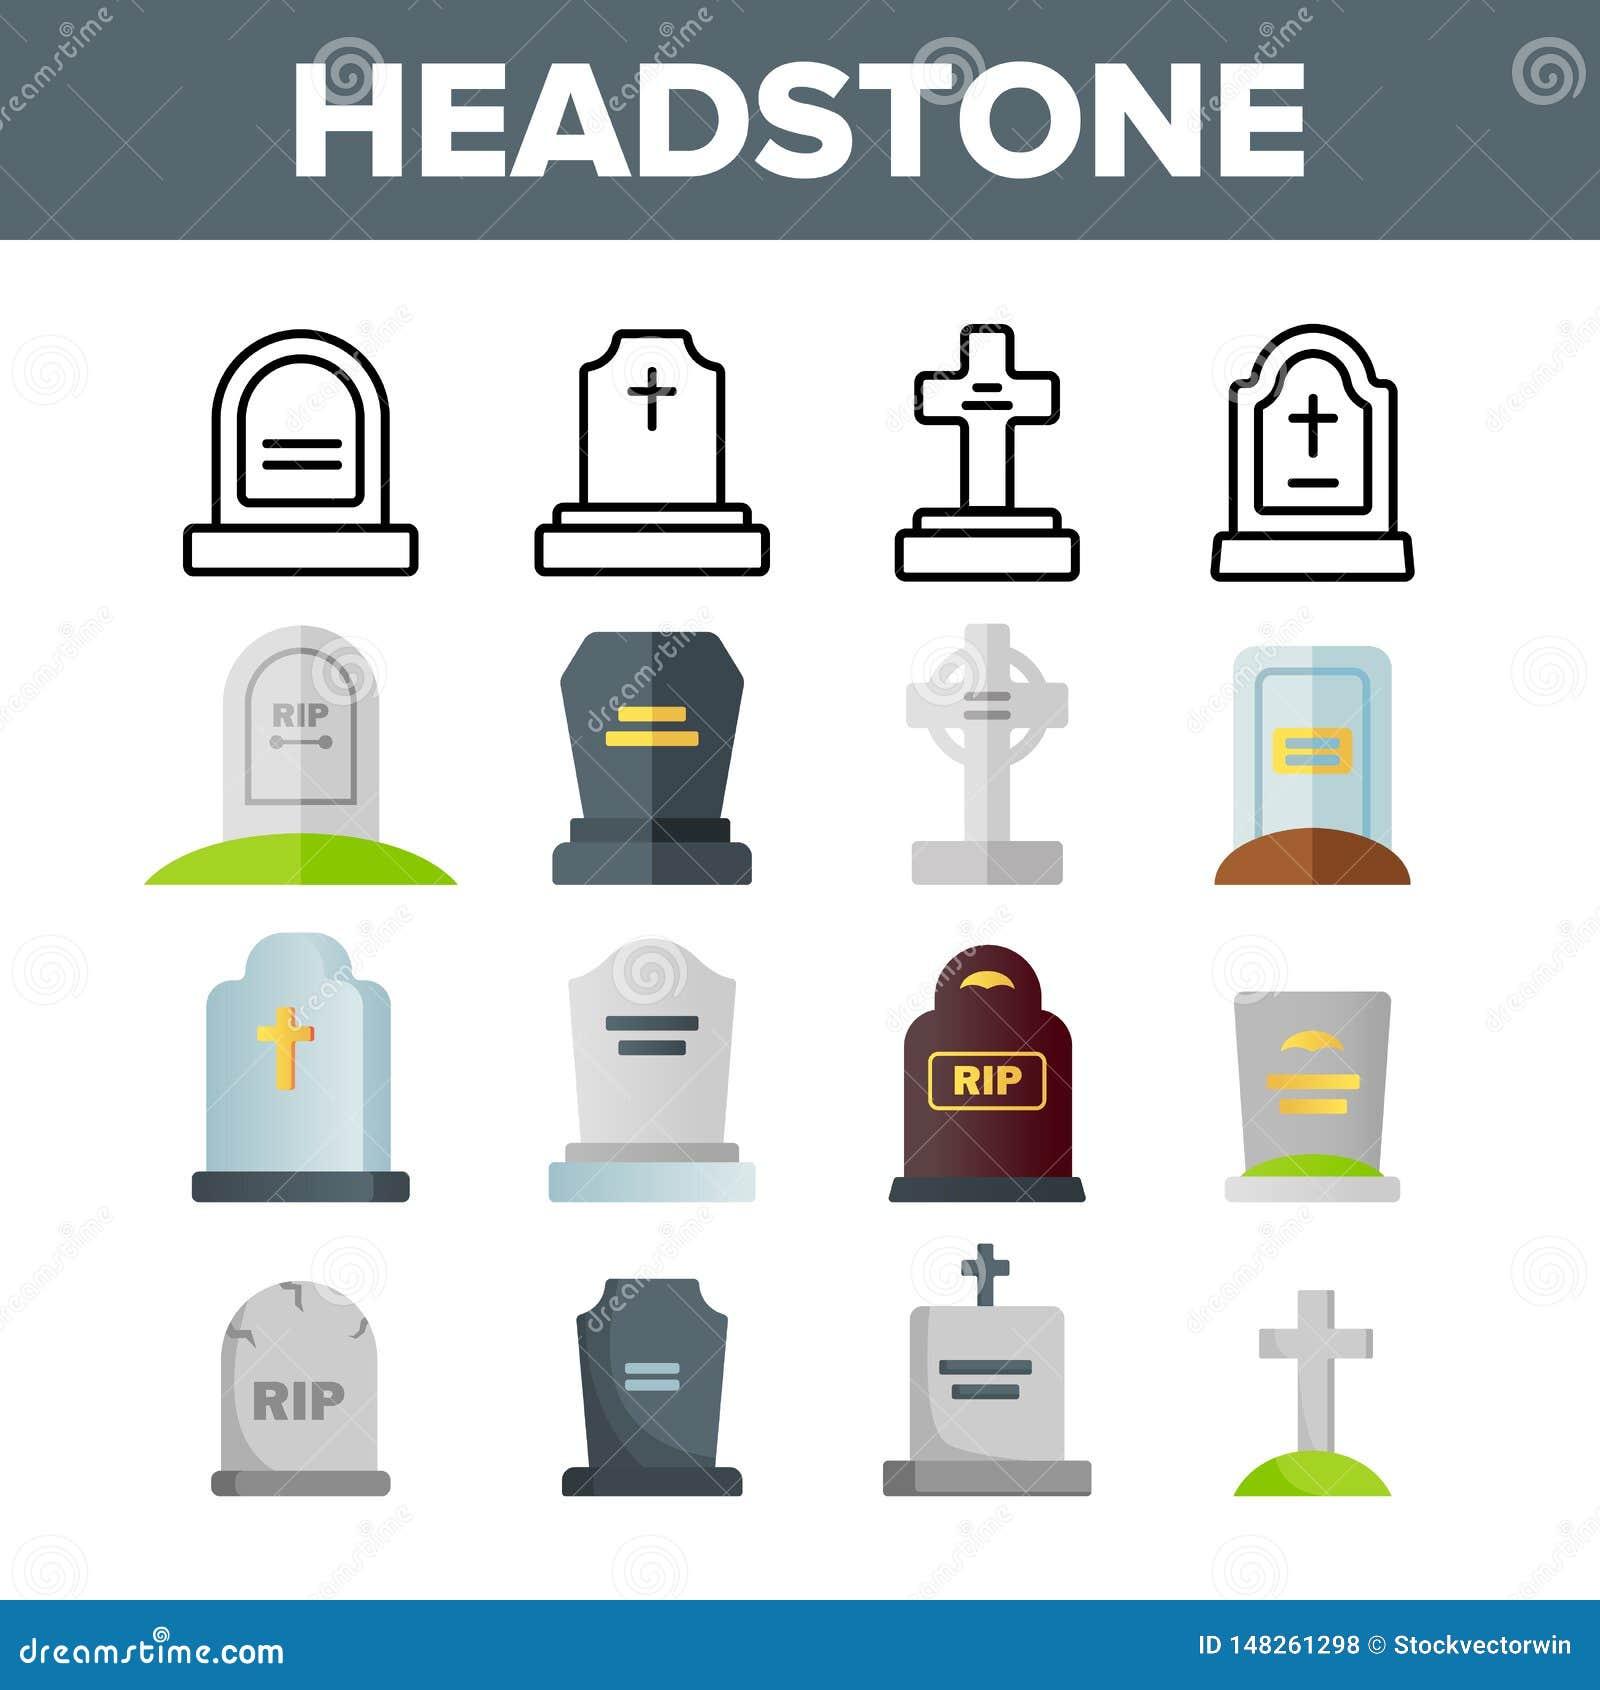 Headstone, Gravestone, Tombstone Vector Color Icons Set